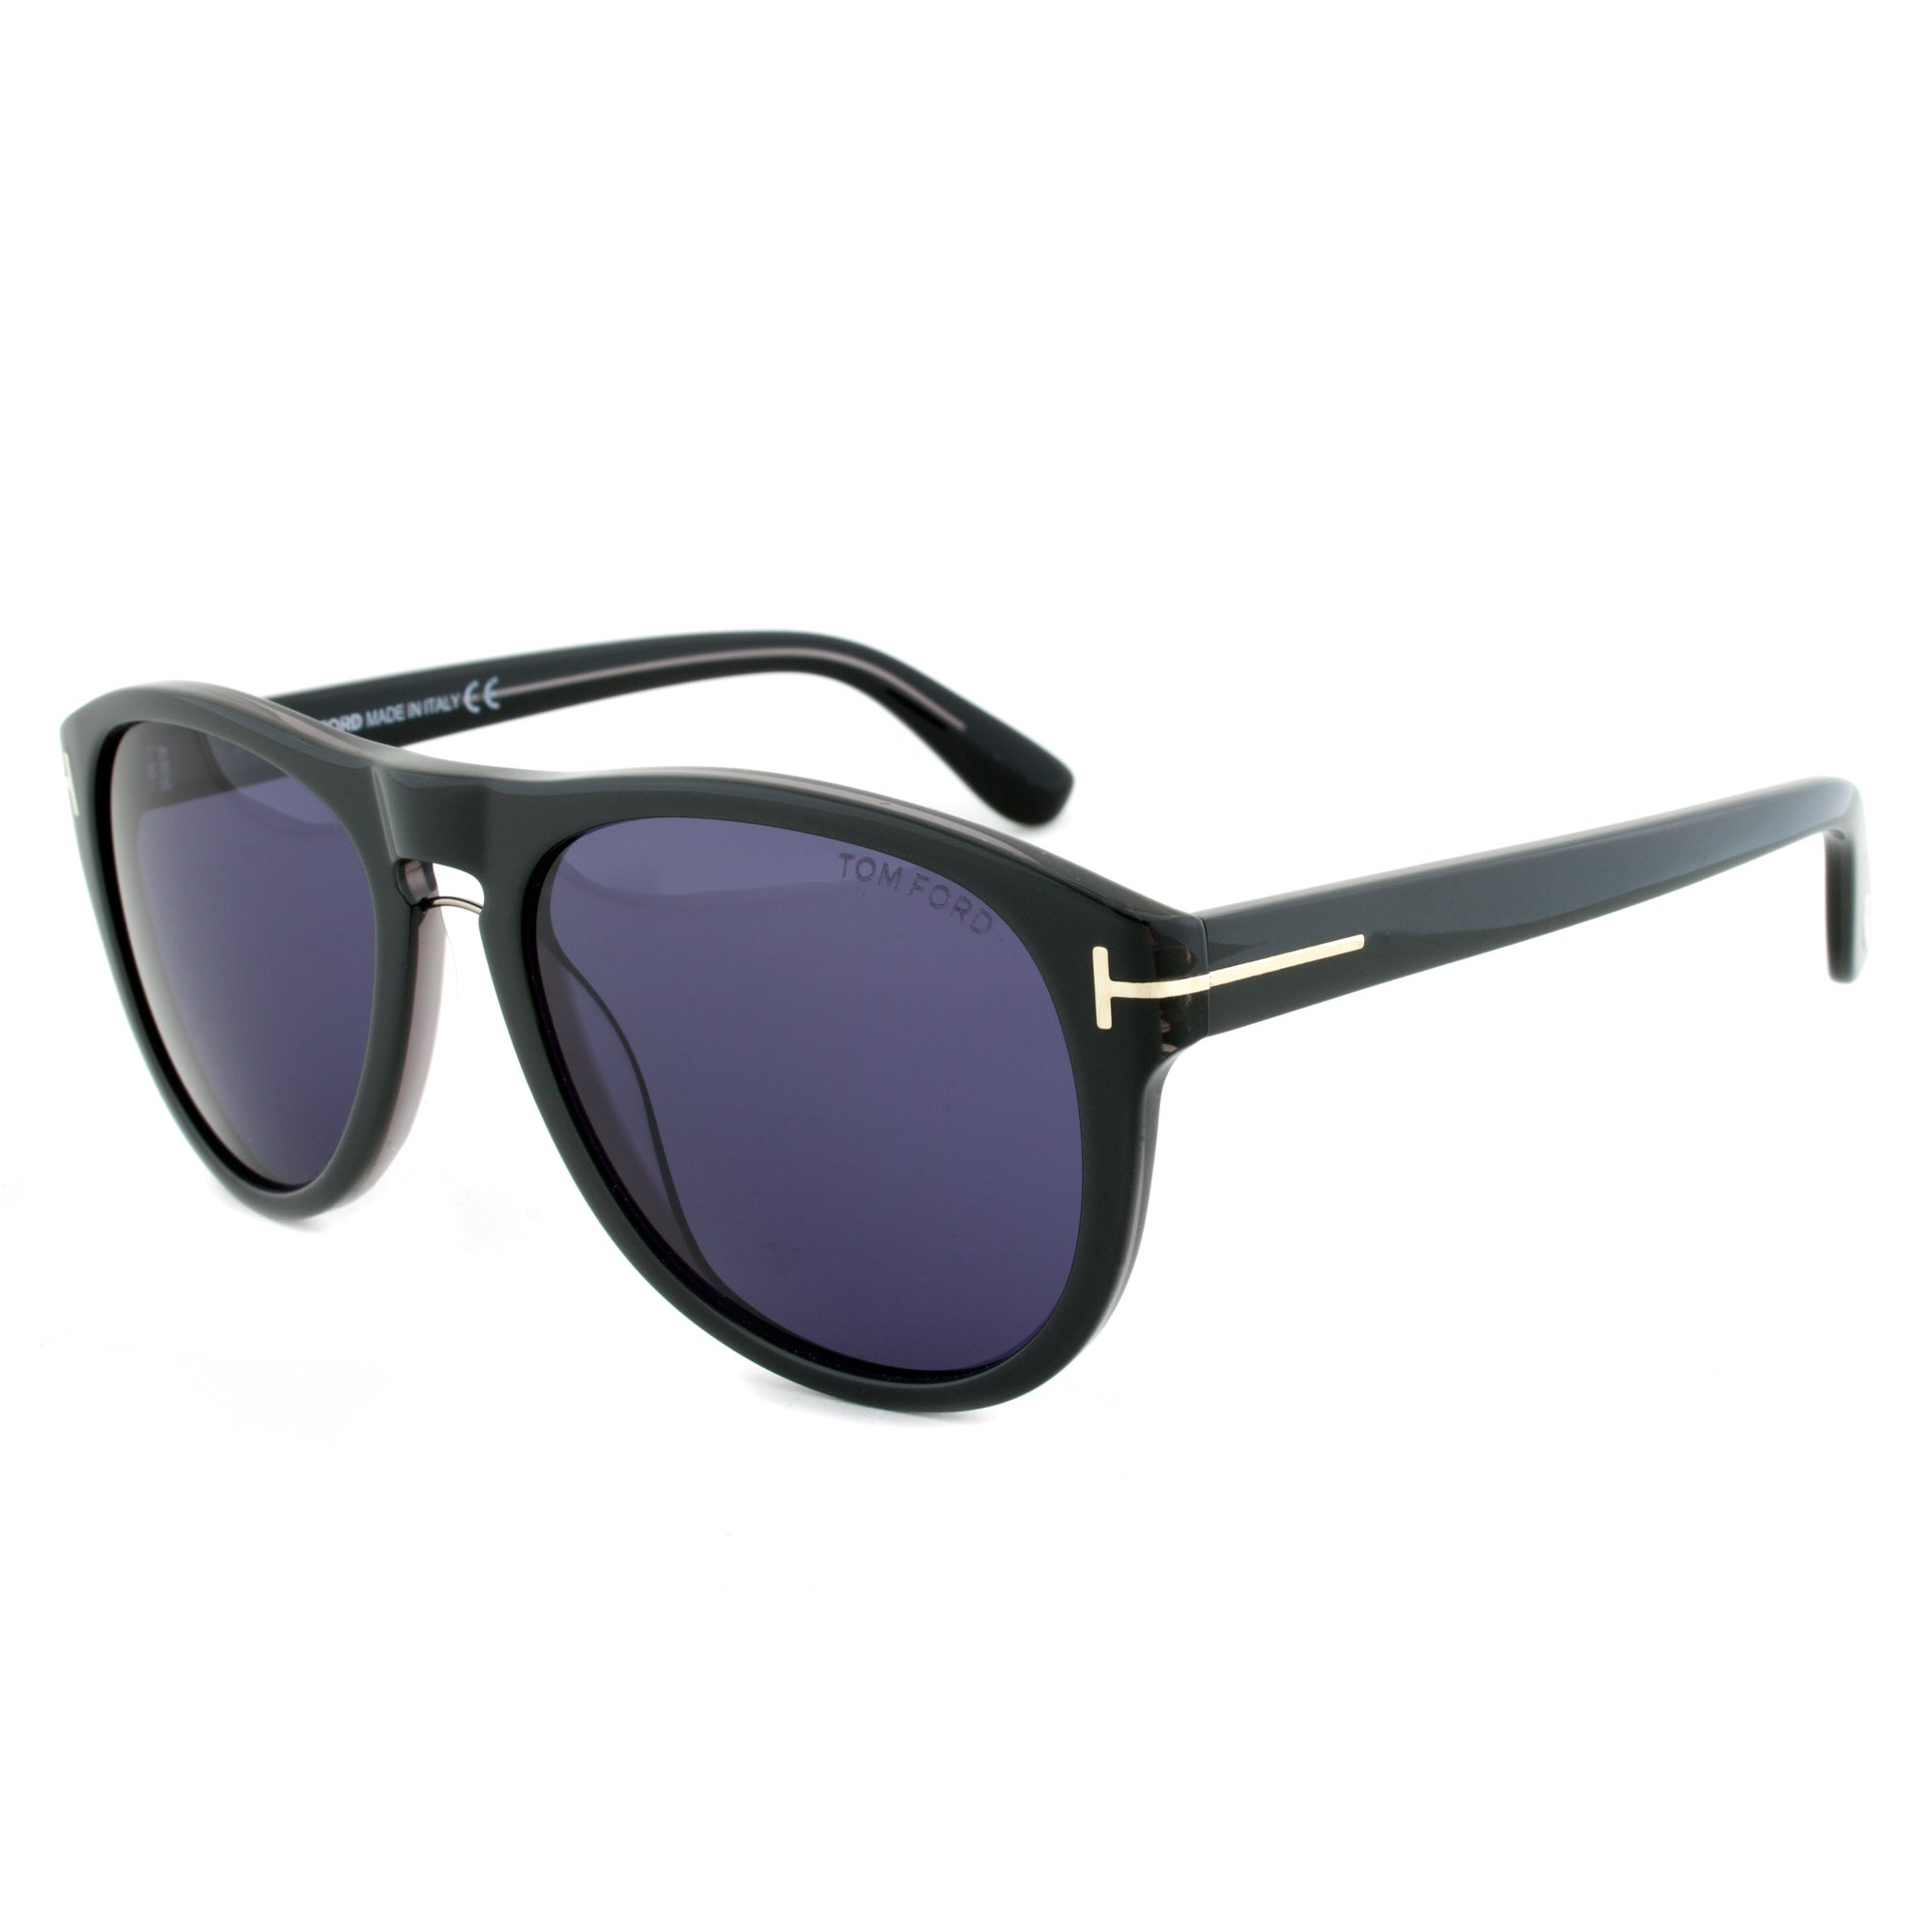 547dce5612 Shop Tom Ford TF347 50J Kurt Sunglasses